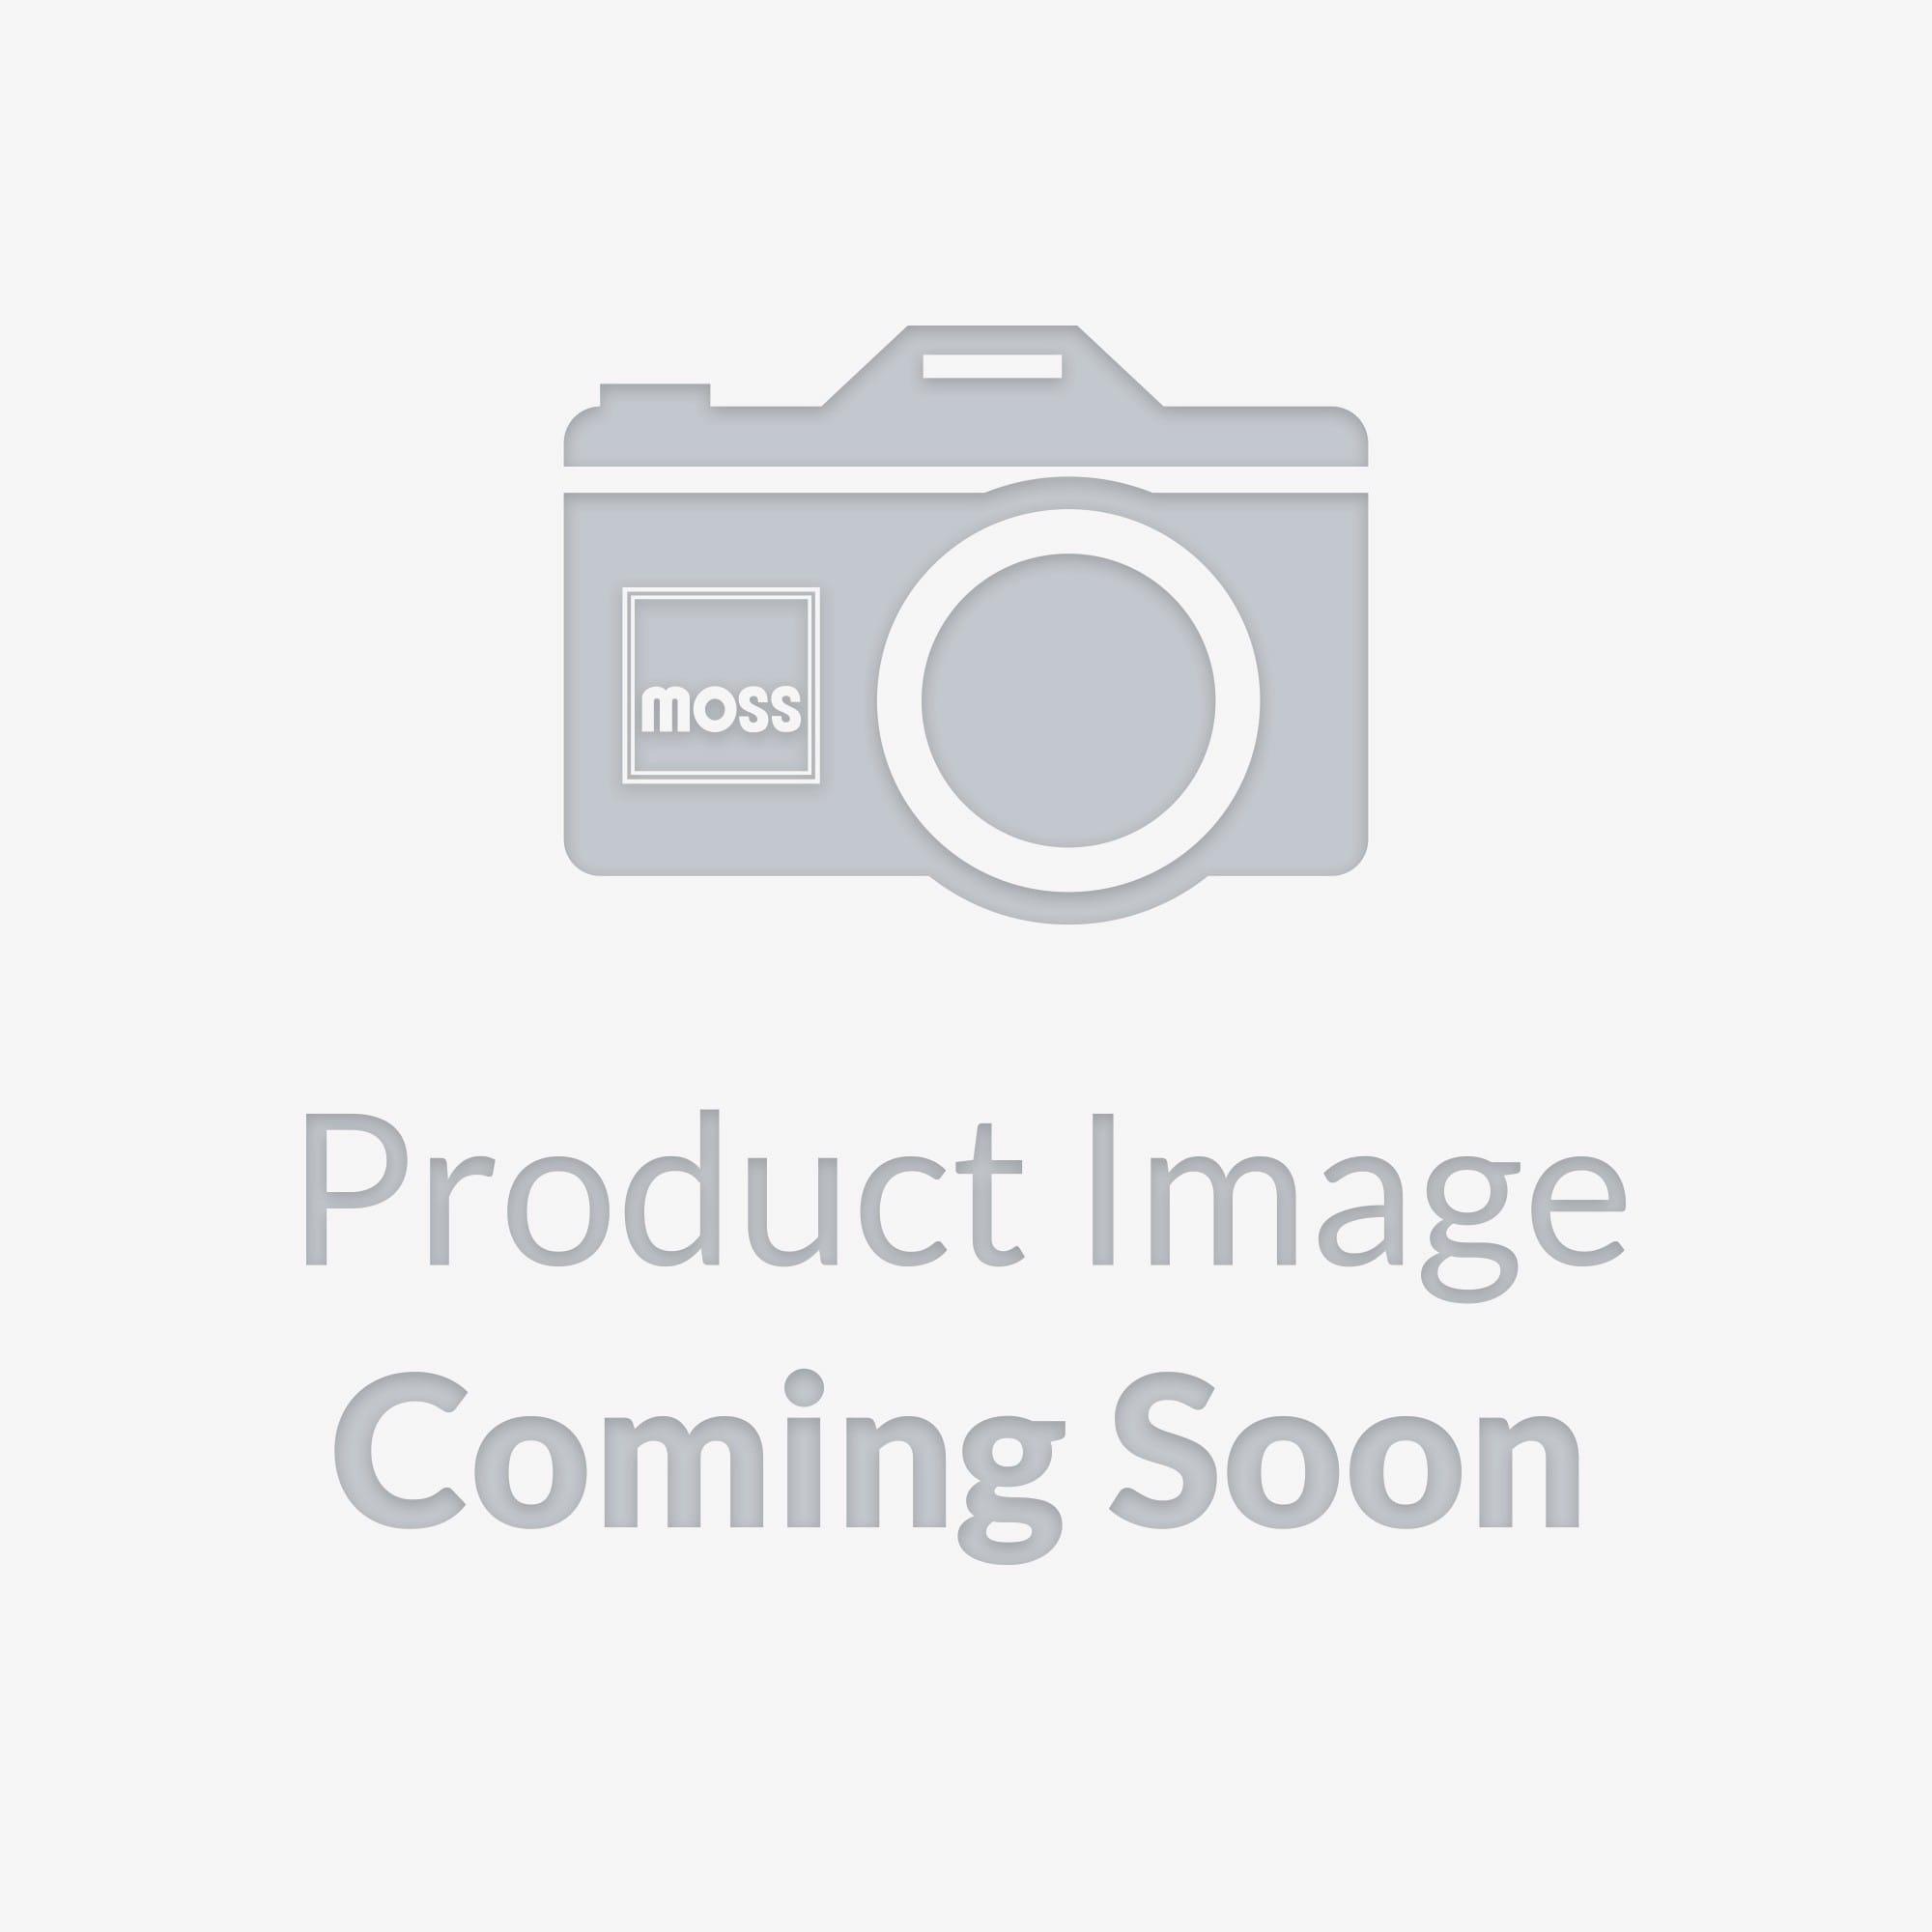 MG MGC METAL SIGN.MG CLASSIC BRITISH CARS.GARAGE,COLLECTABLE.